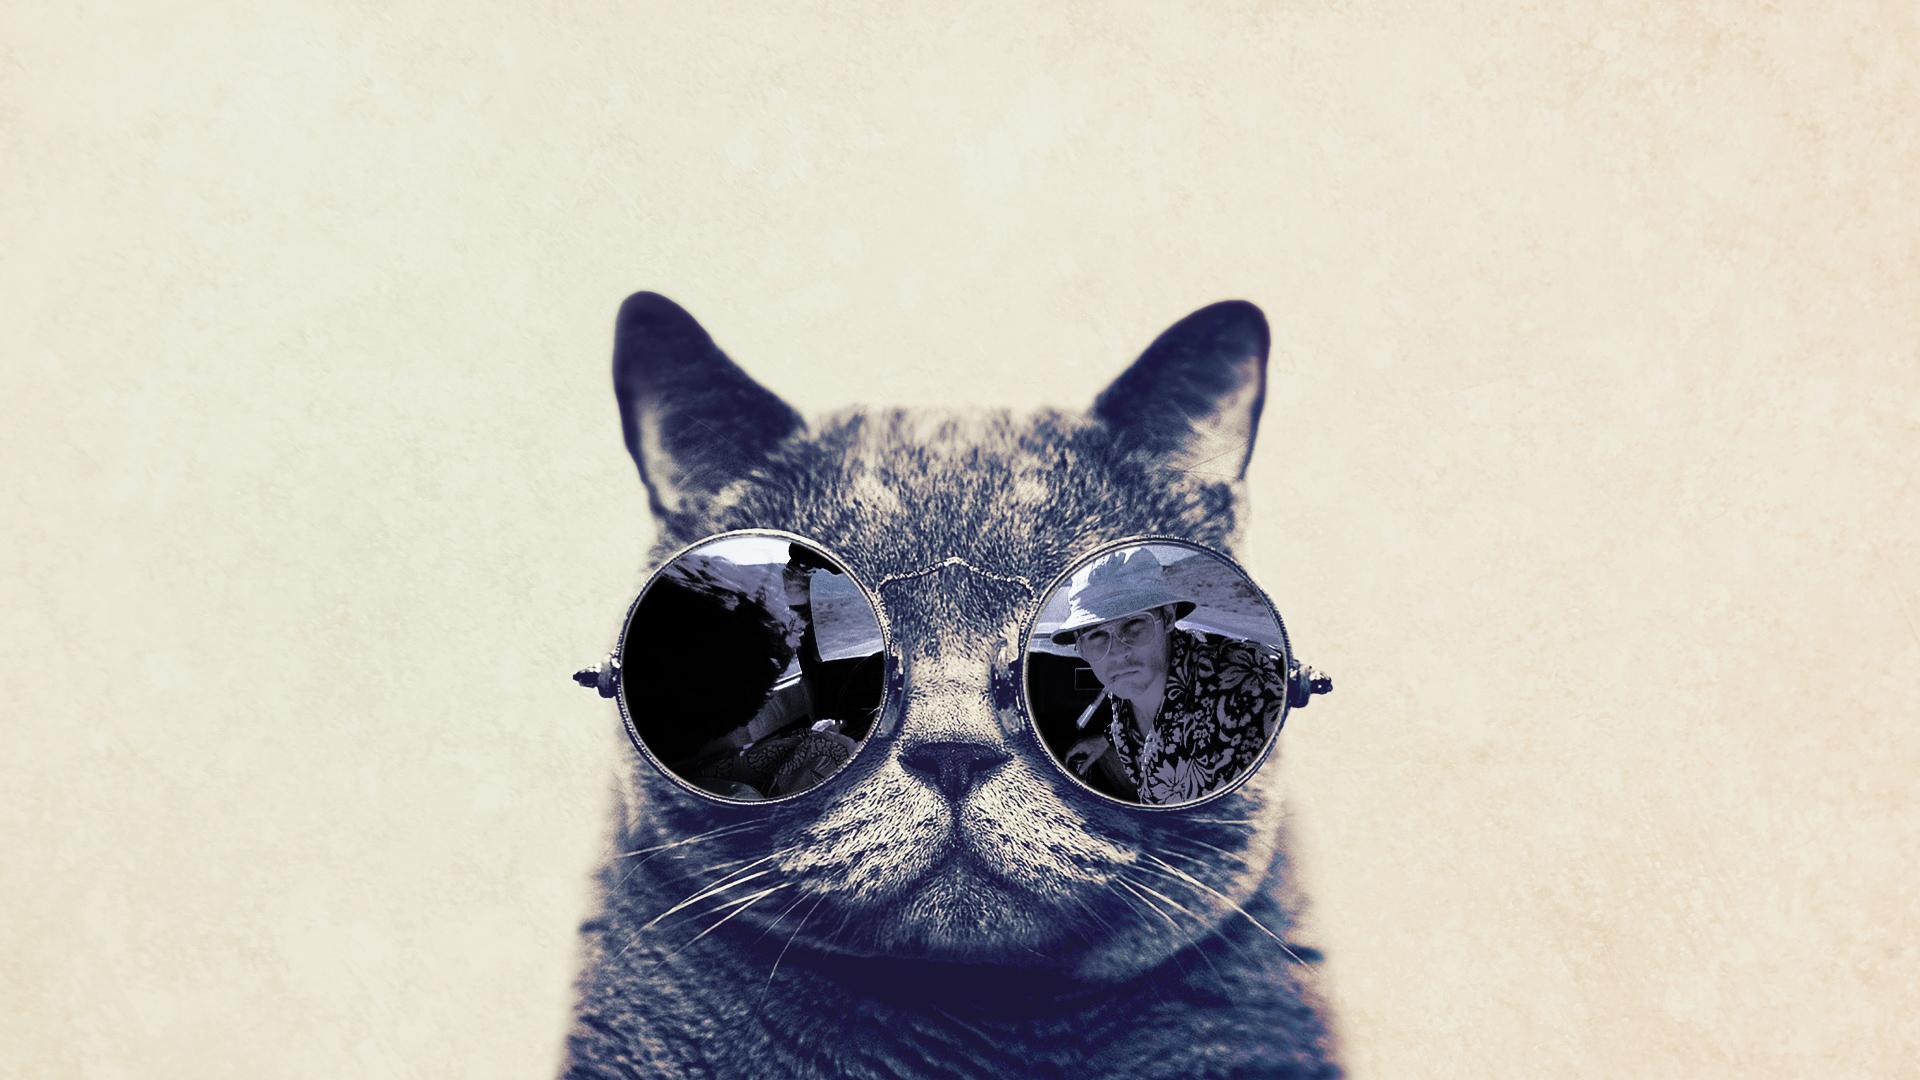 Goggles Girl Wallpaper Fashion Cat With Sunglasses Hd Funny Wallpaper